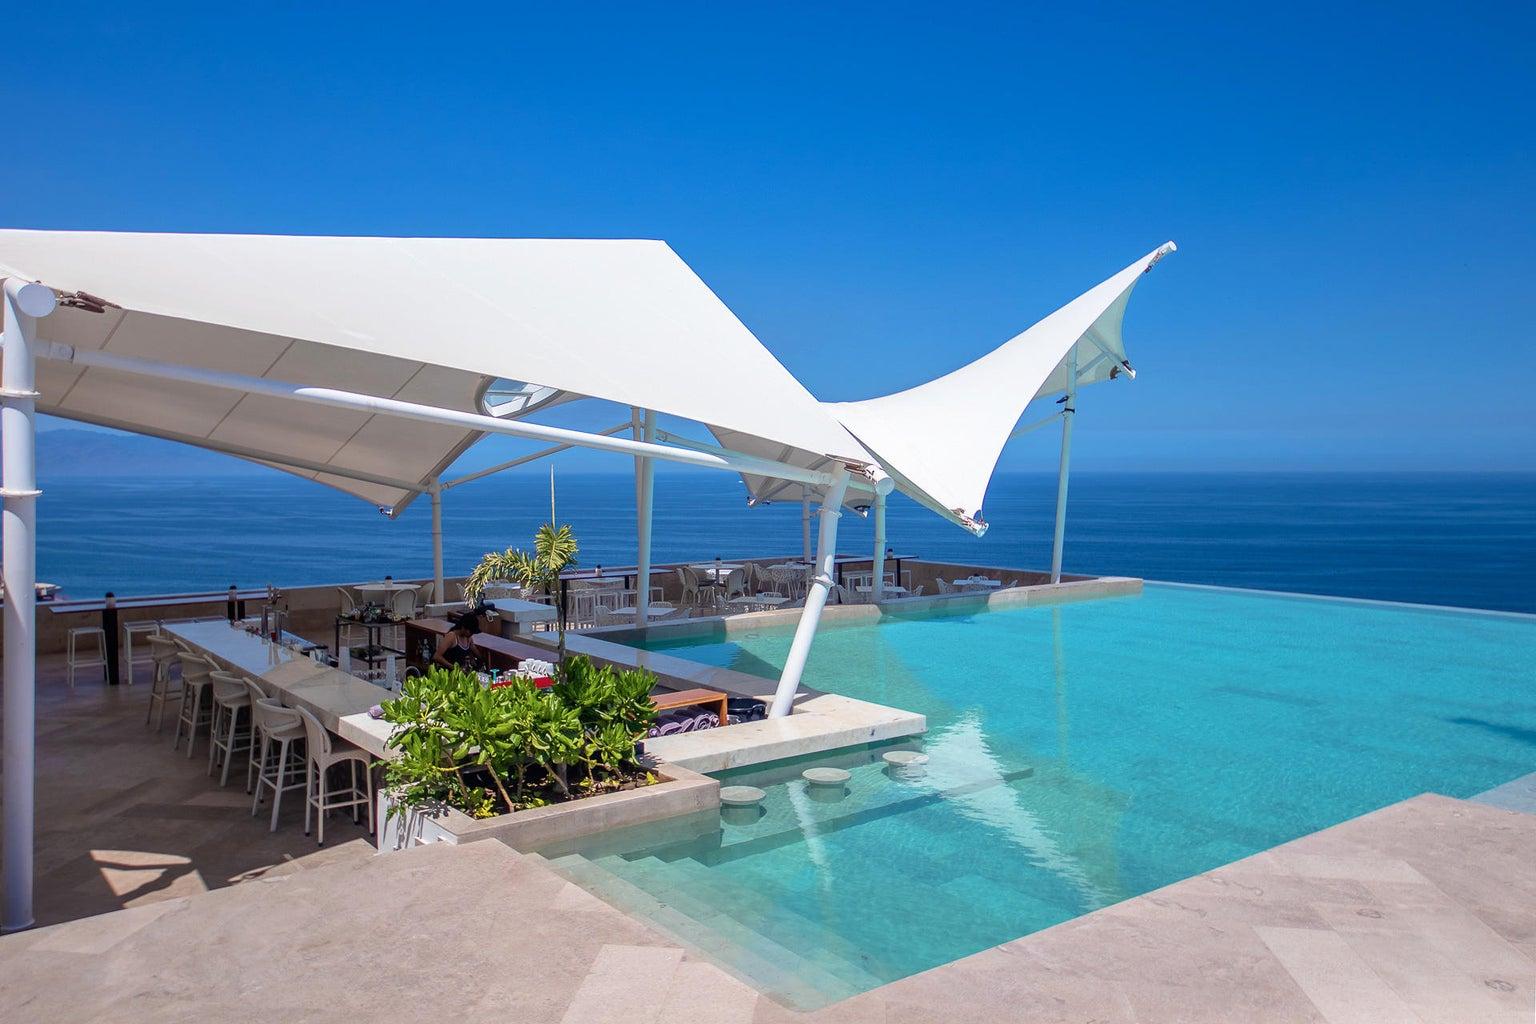 bar, kitchen and swim up bar on terrace